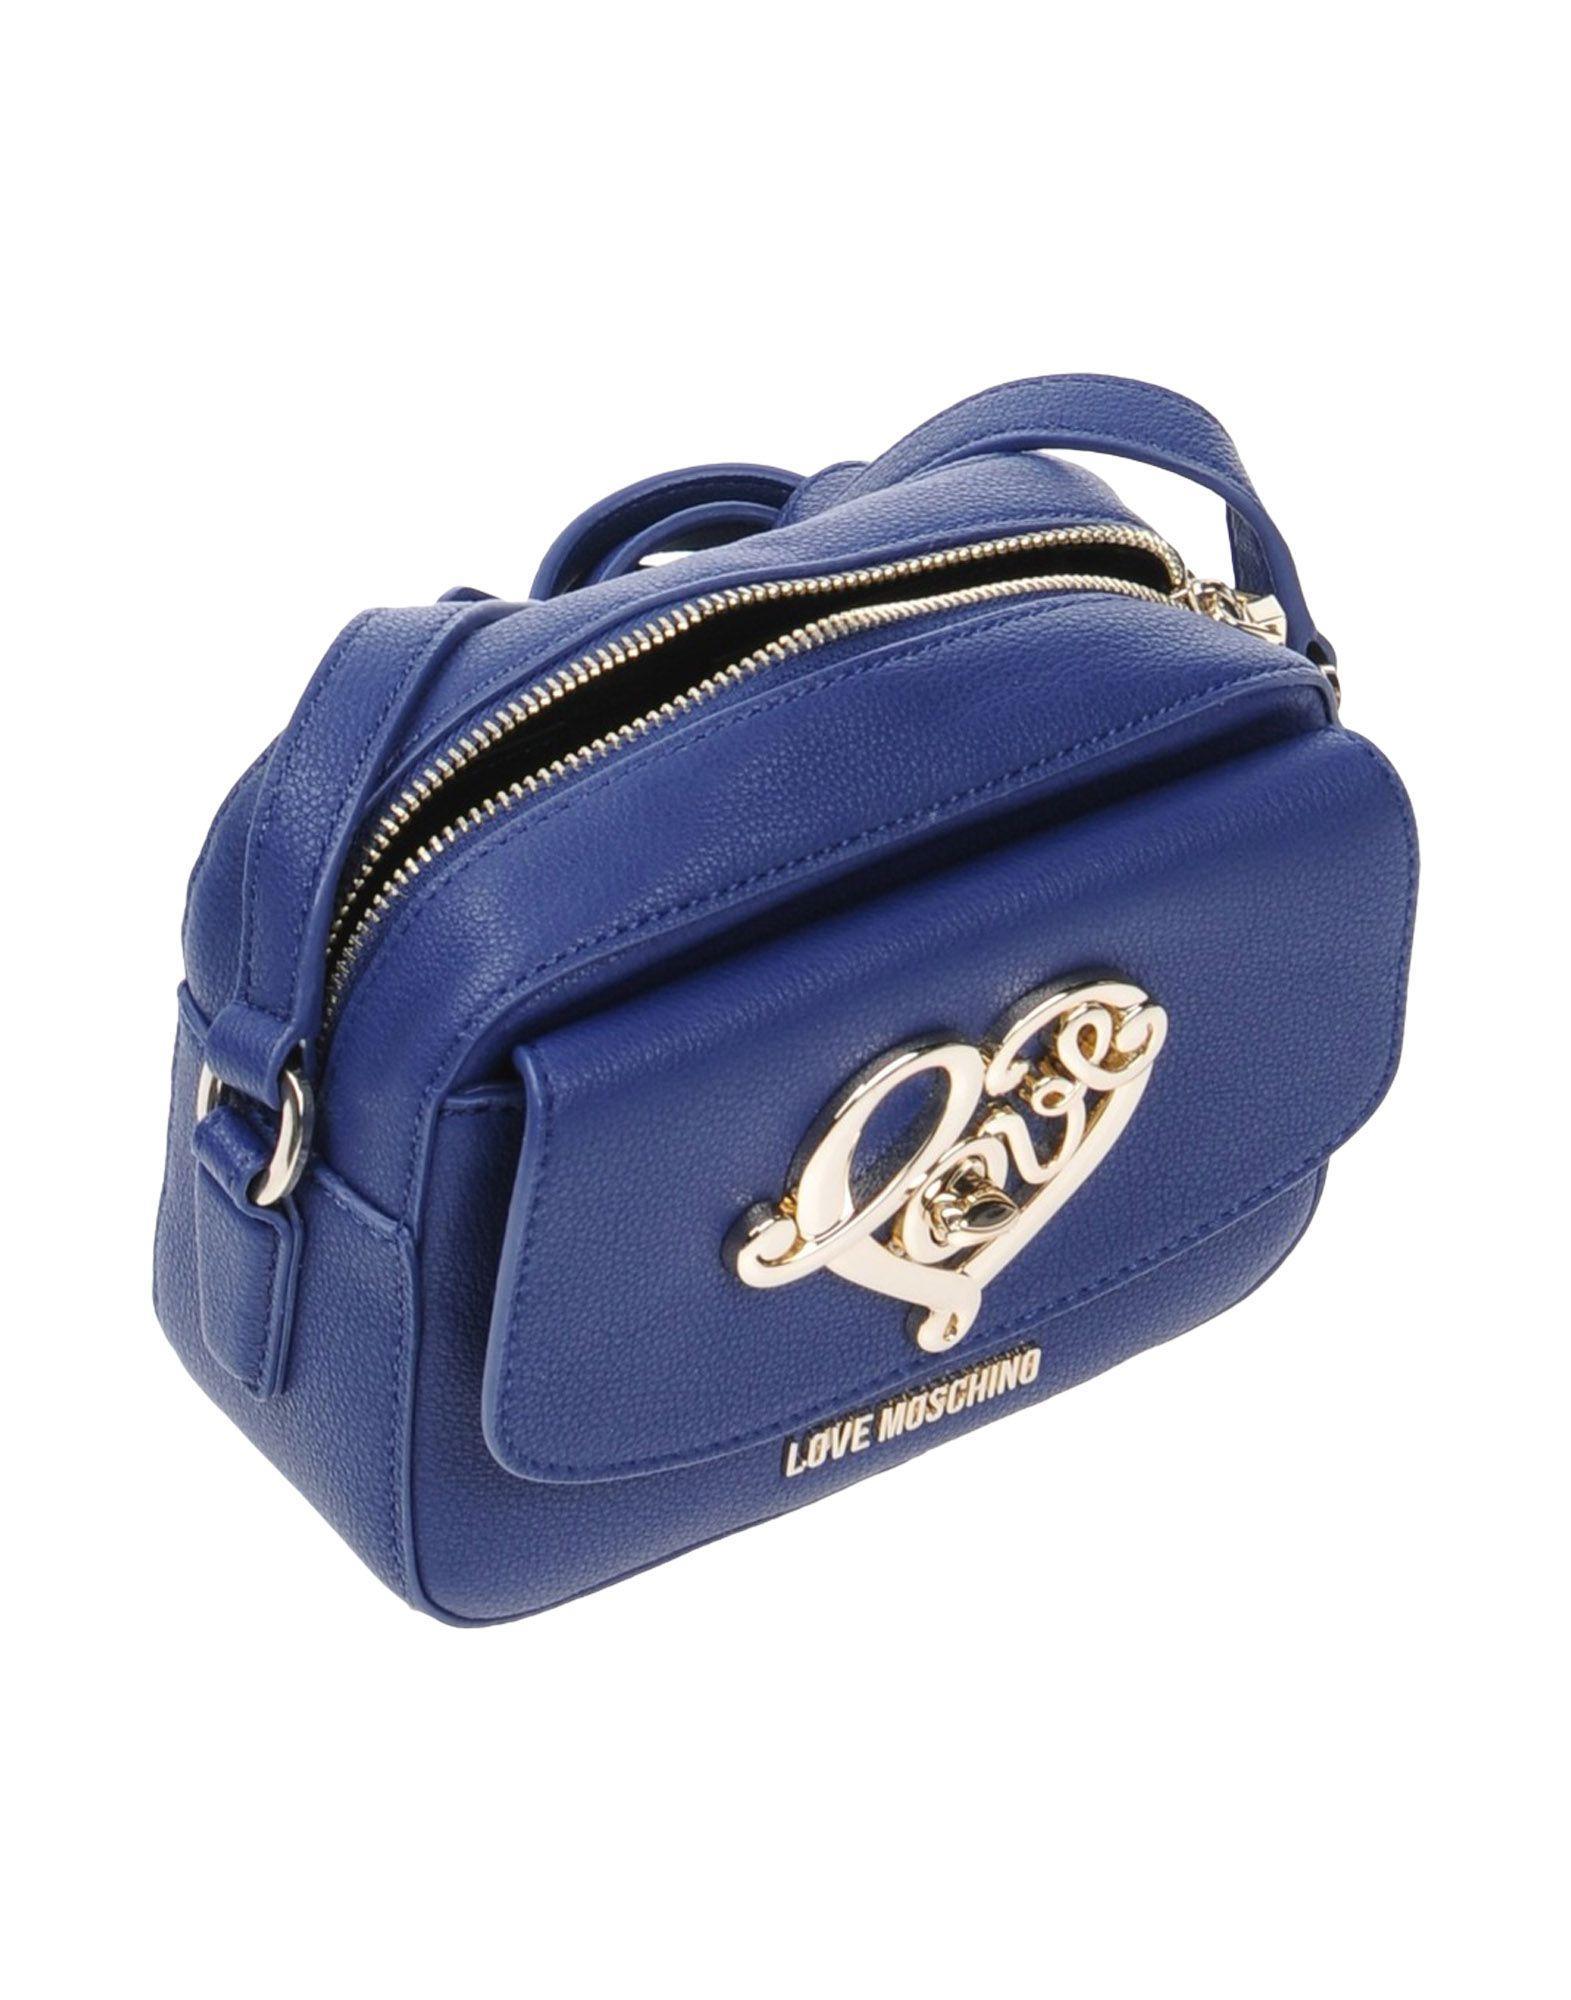 Love Moschino Cross-body Bag in Dark Blue (Blue)